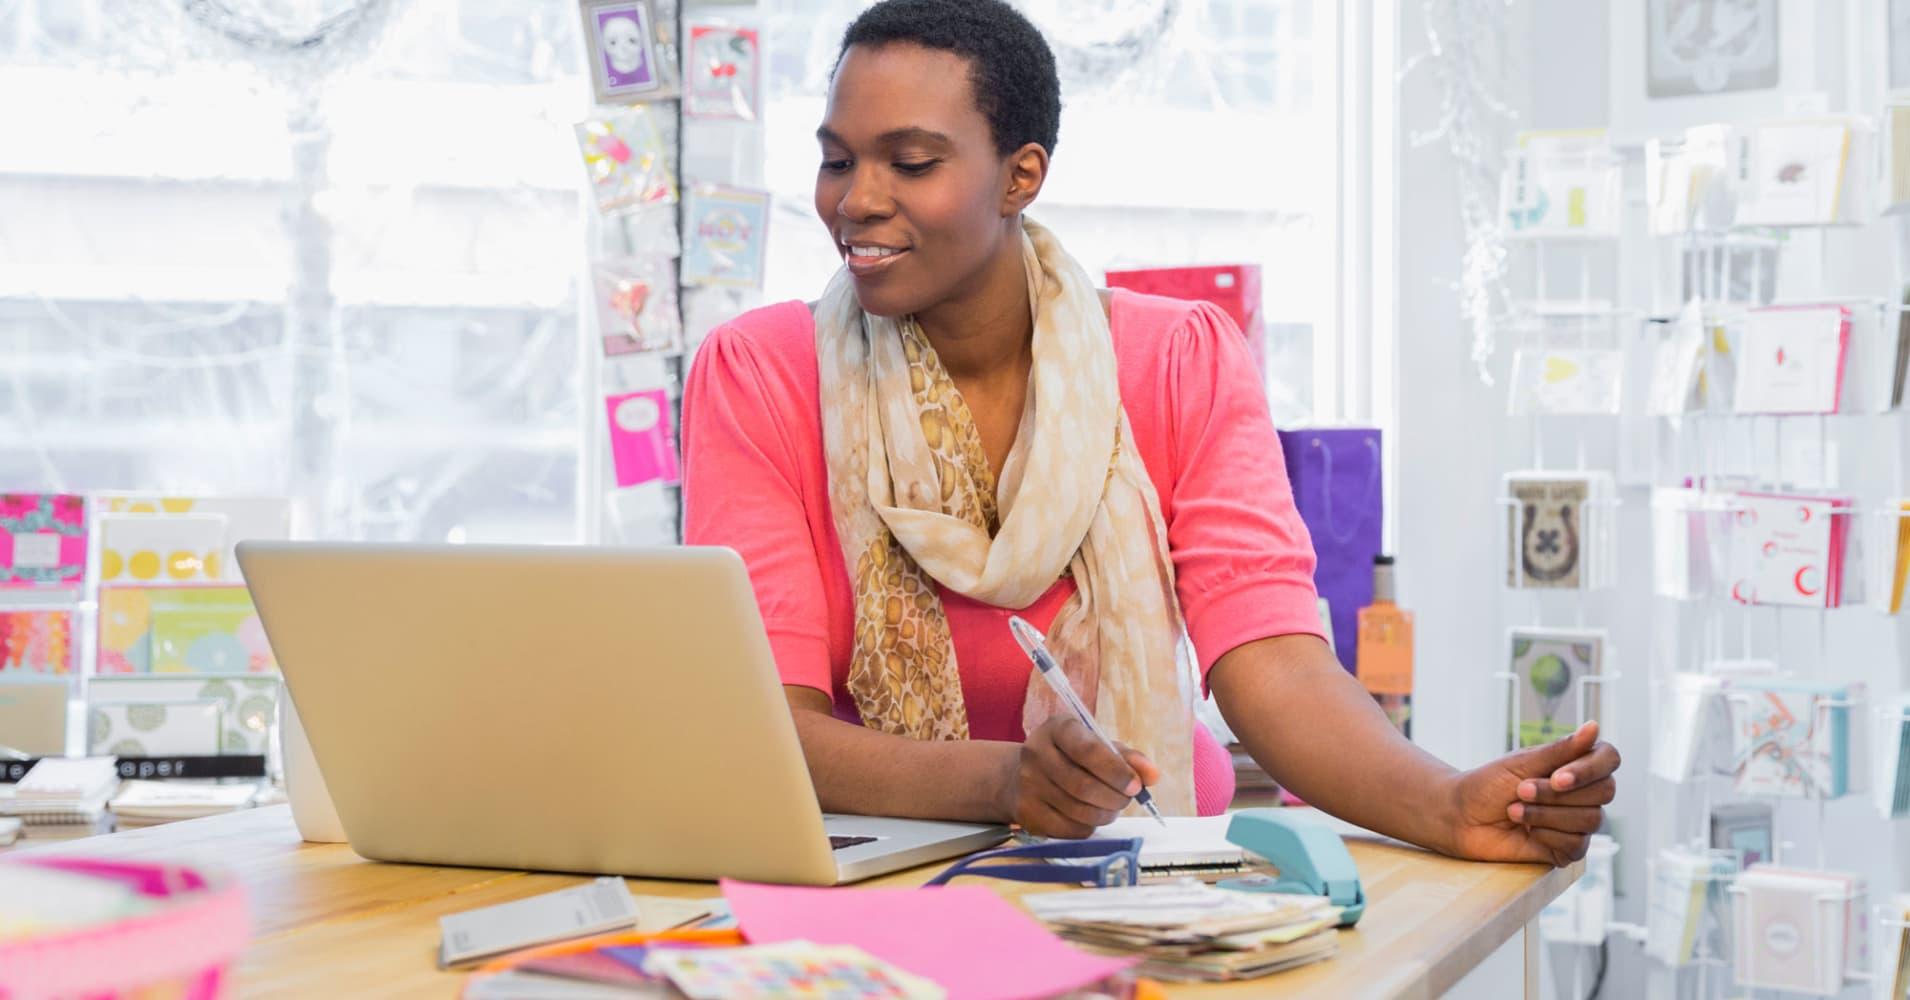 Entrepreneur woman minority